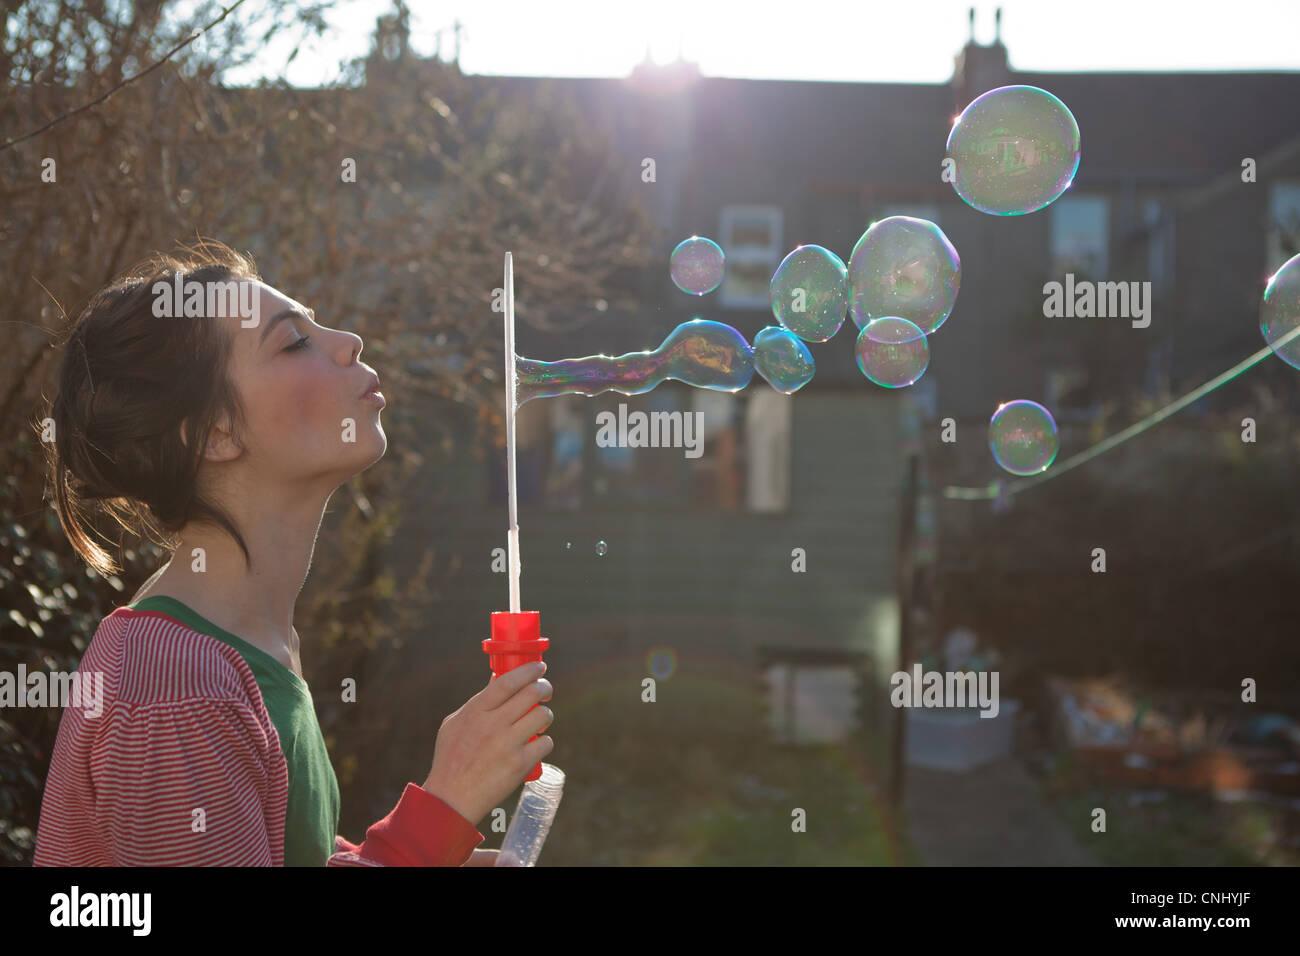 Junge Frau bläst Seifenblasen im freien Stockbild